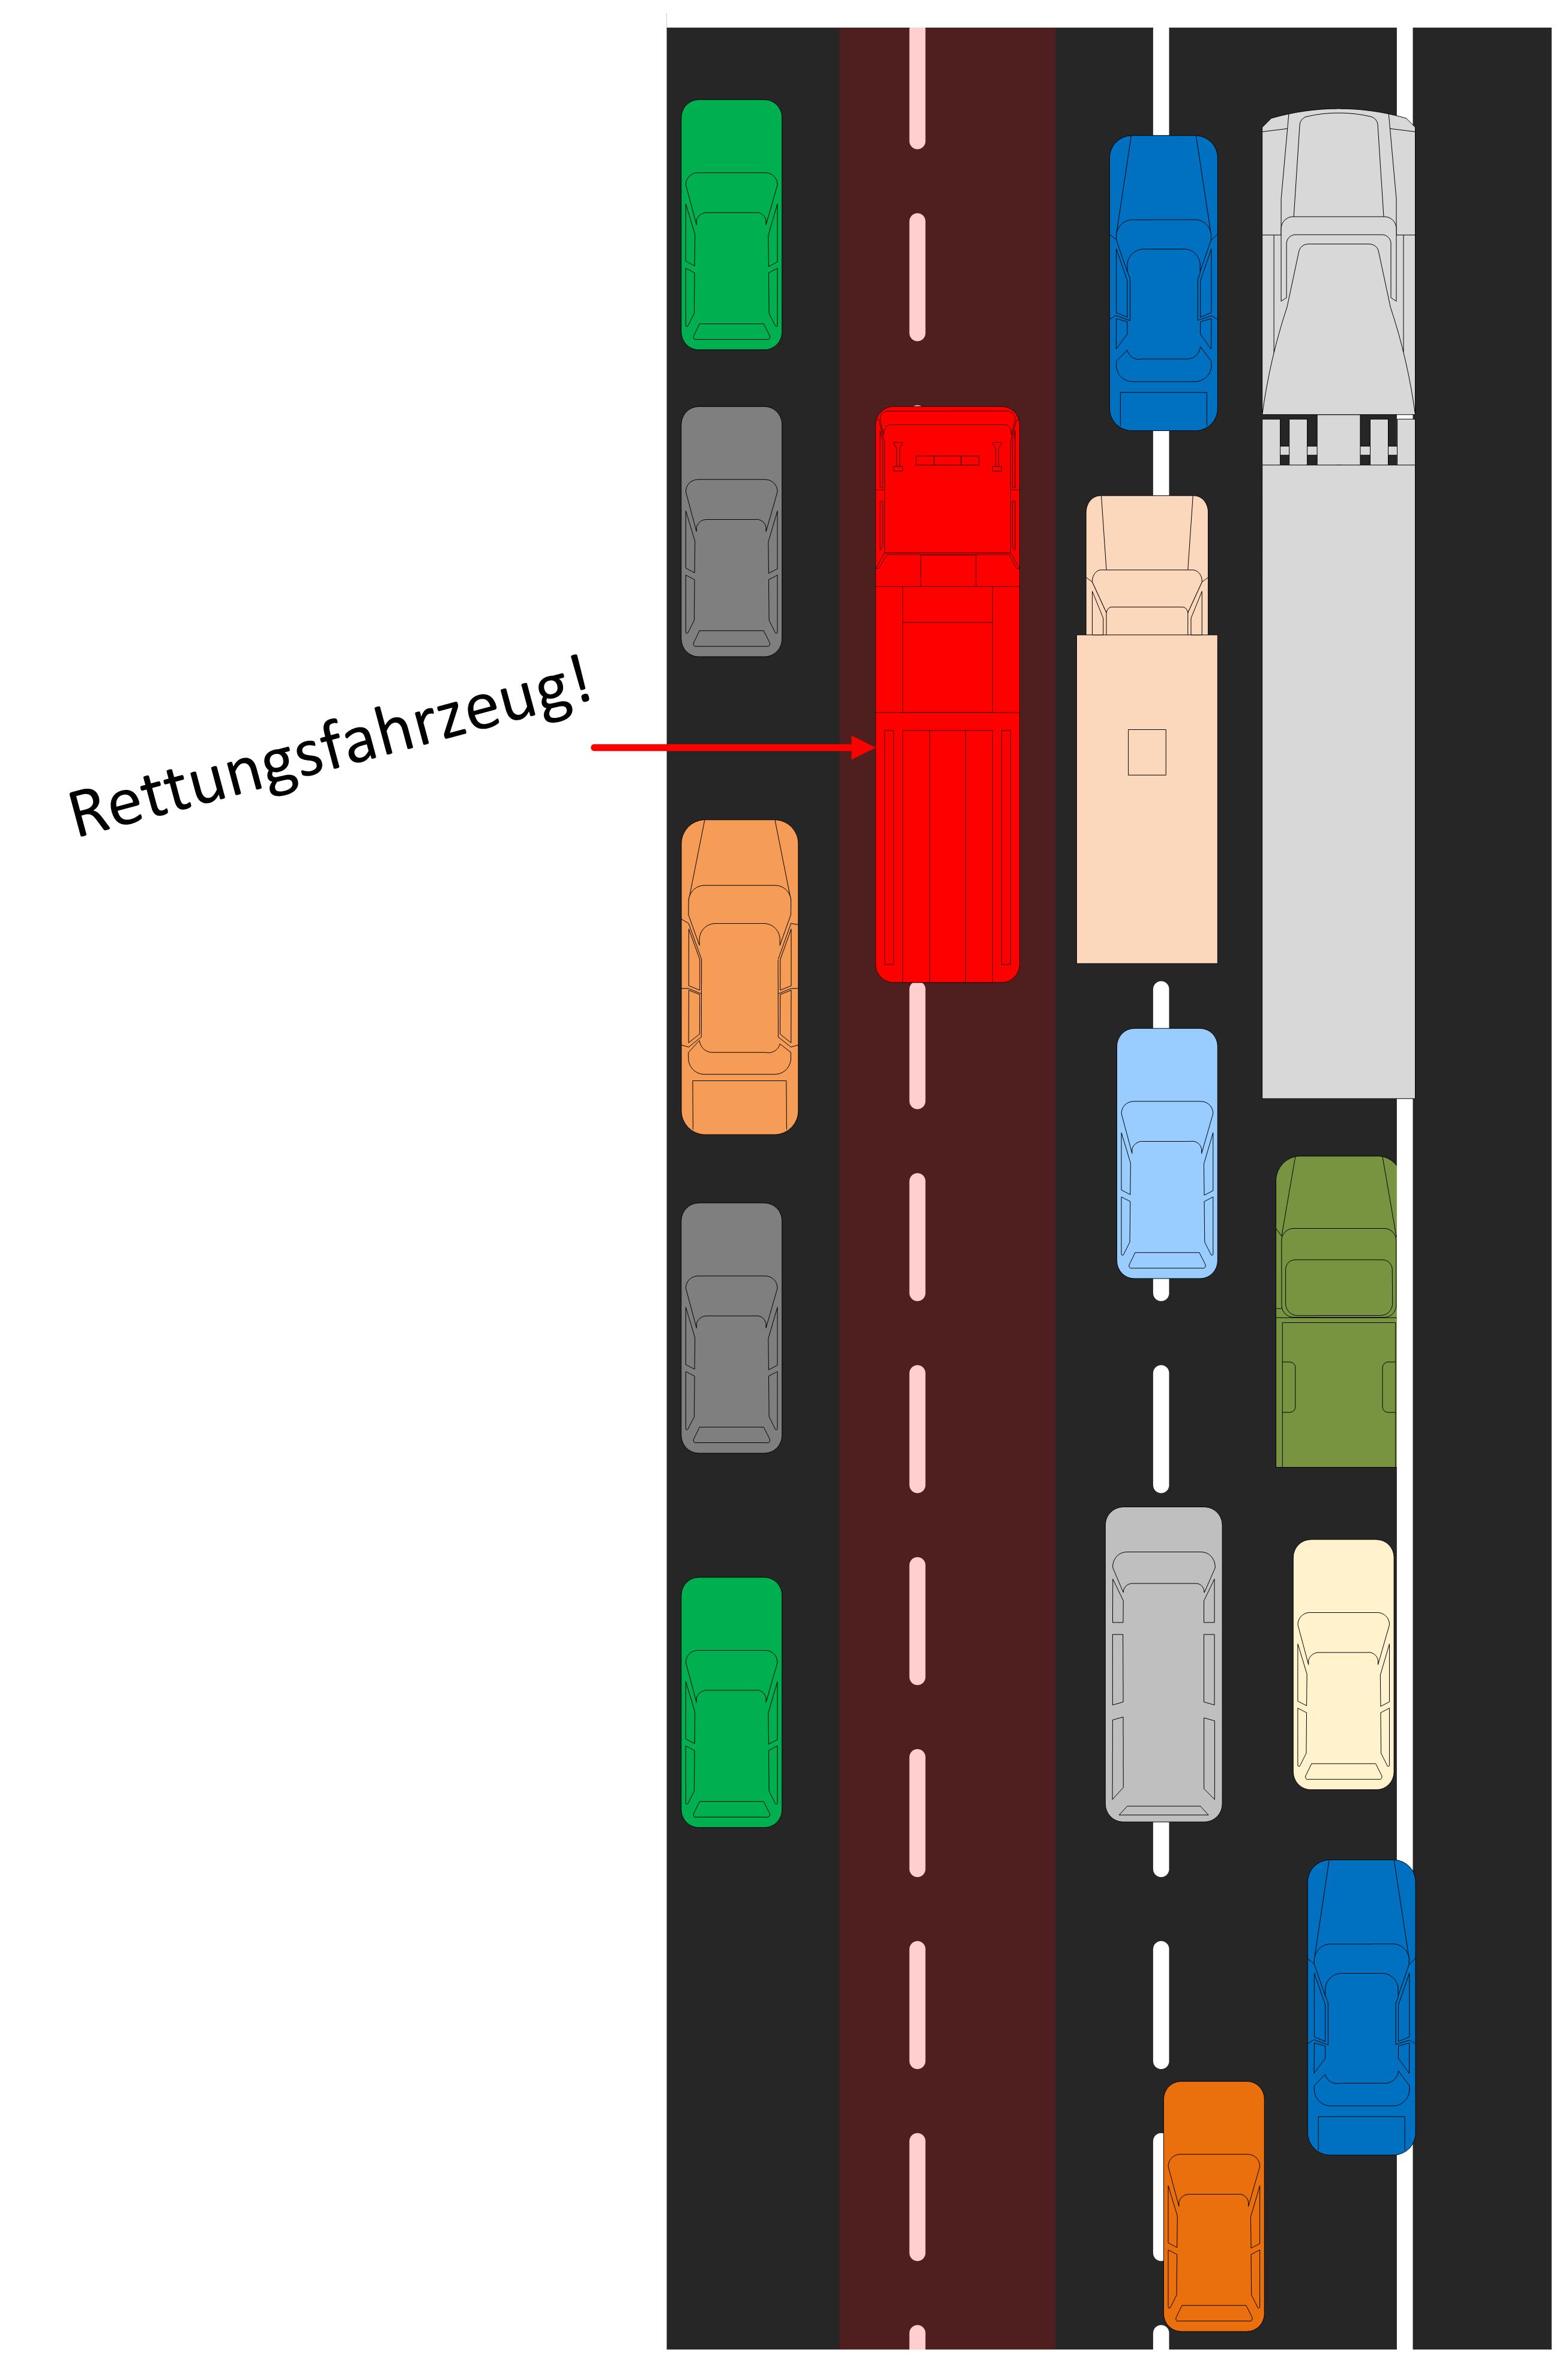 leil.de/di/pics/dreispurige_rettungsgasse.png